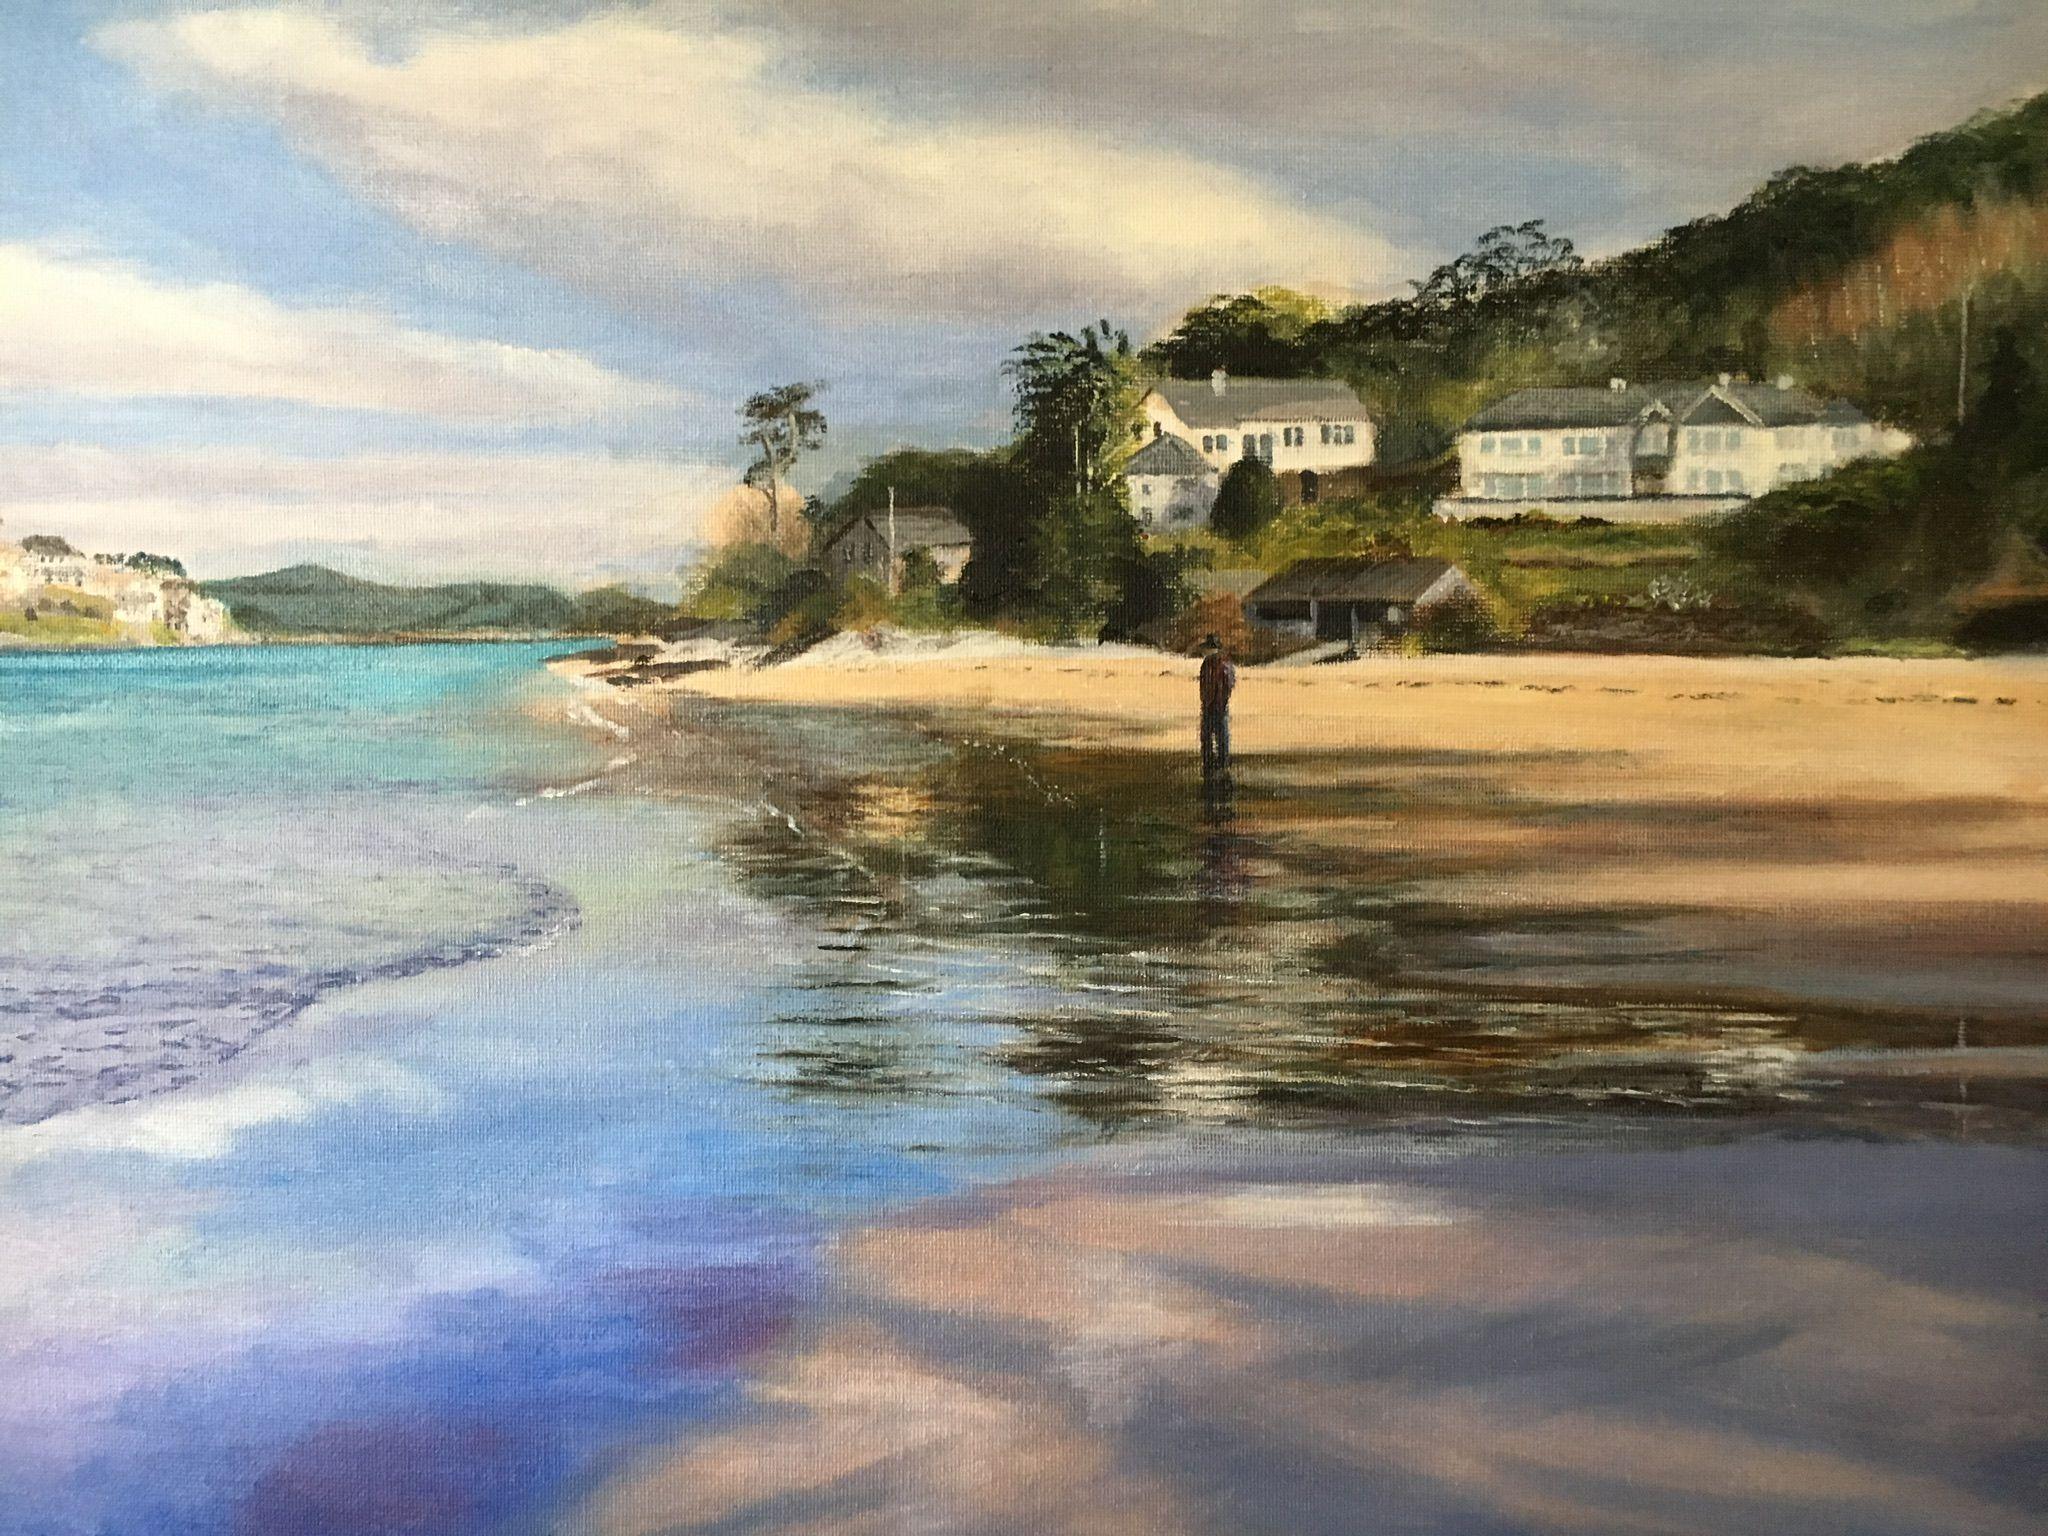 Mill Bay East Potlemouth Devon Landscape Paintings Seascape Shipman